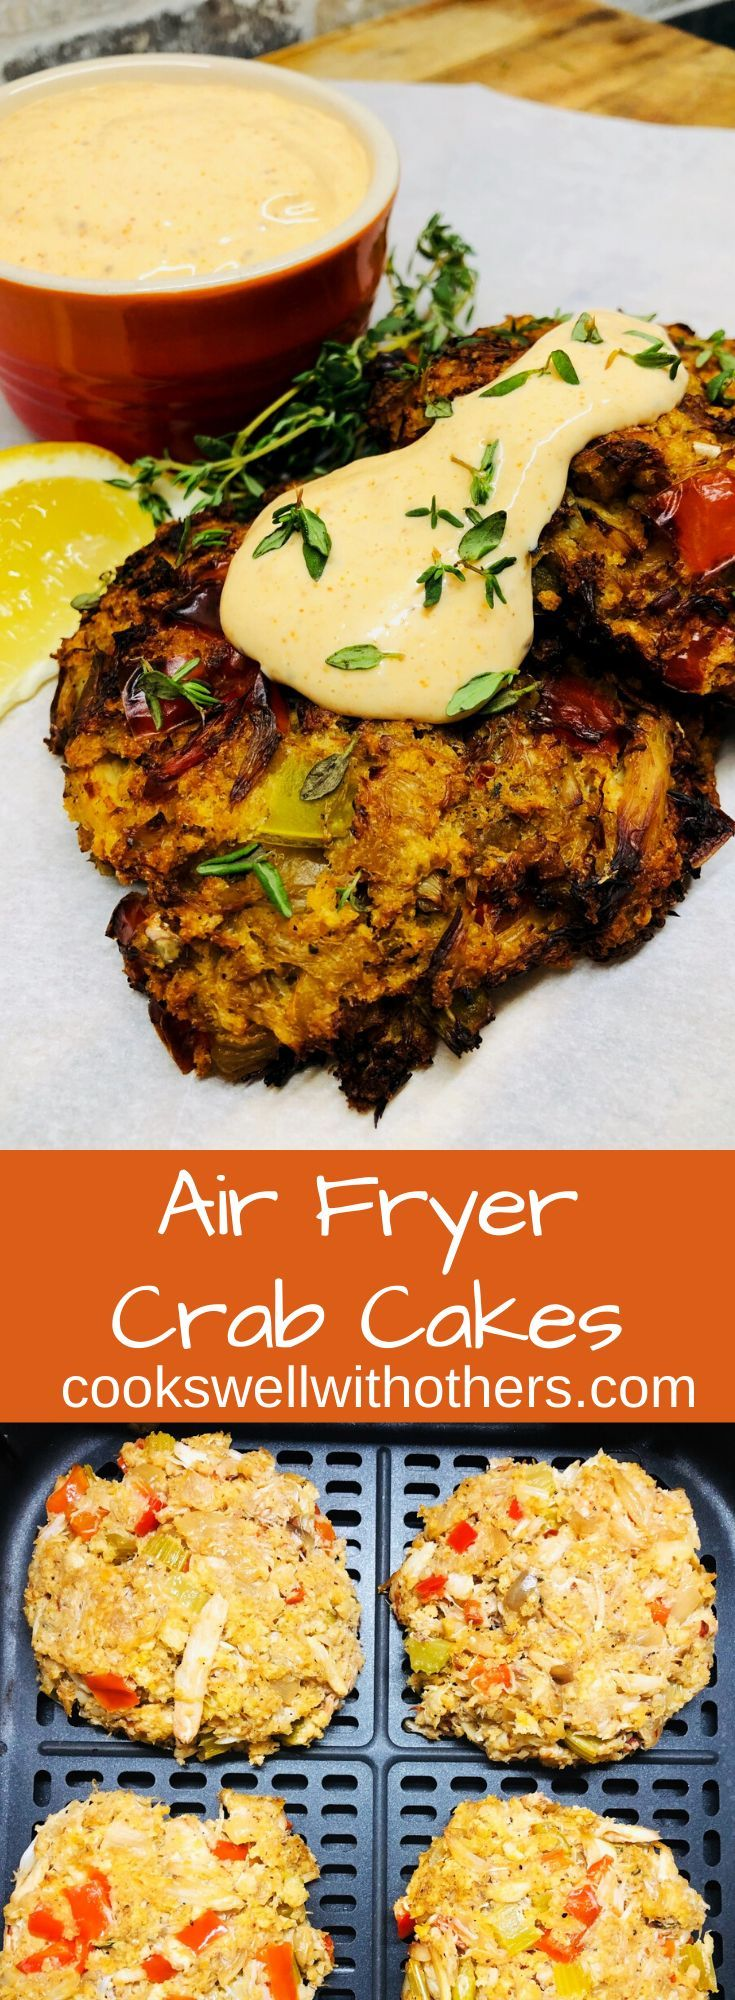 Air fryer crab cakes seafood recipes crab cakes food